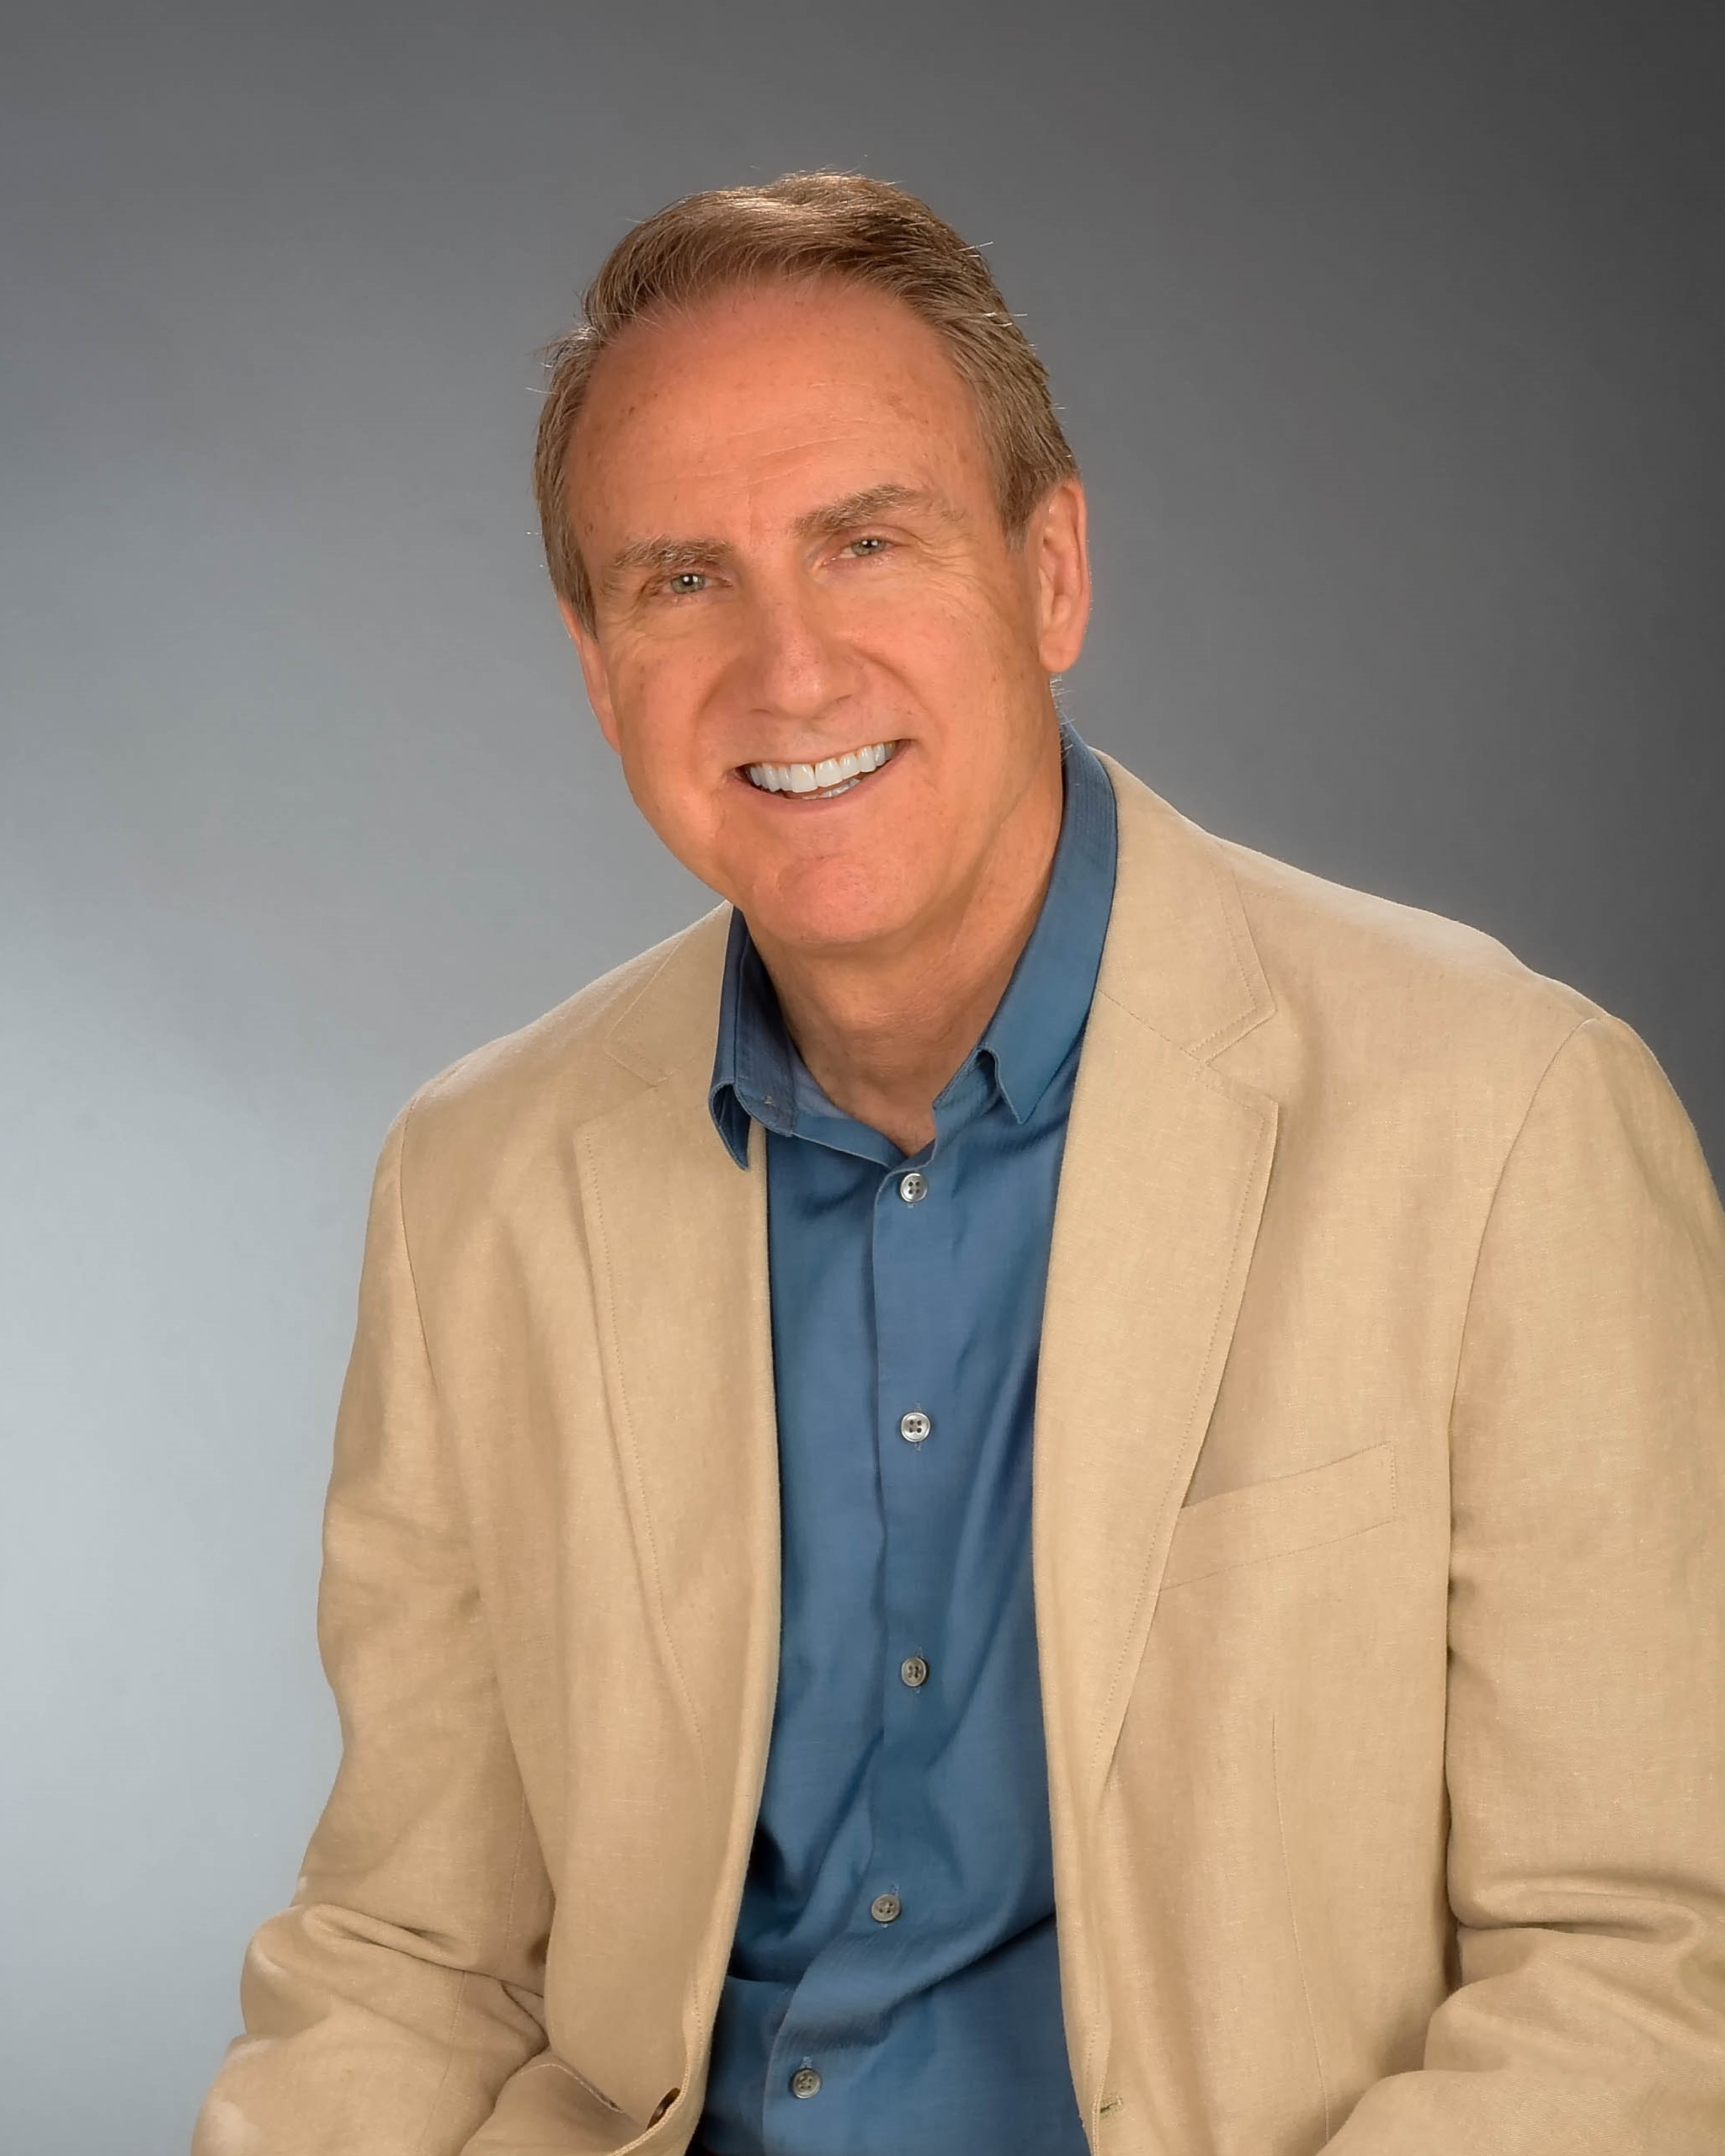 Dr. Thomas W. Bennett